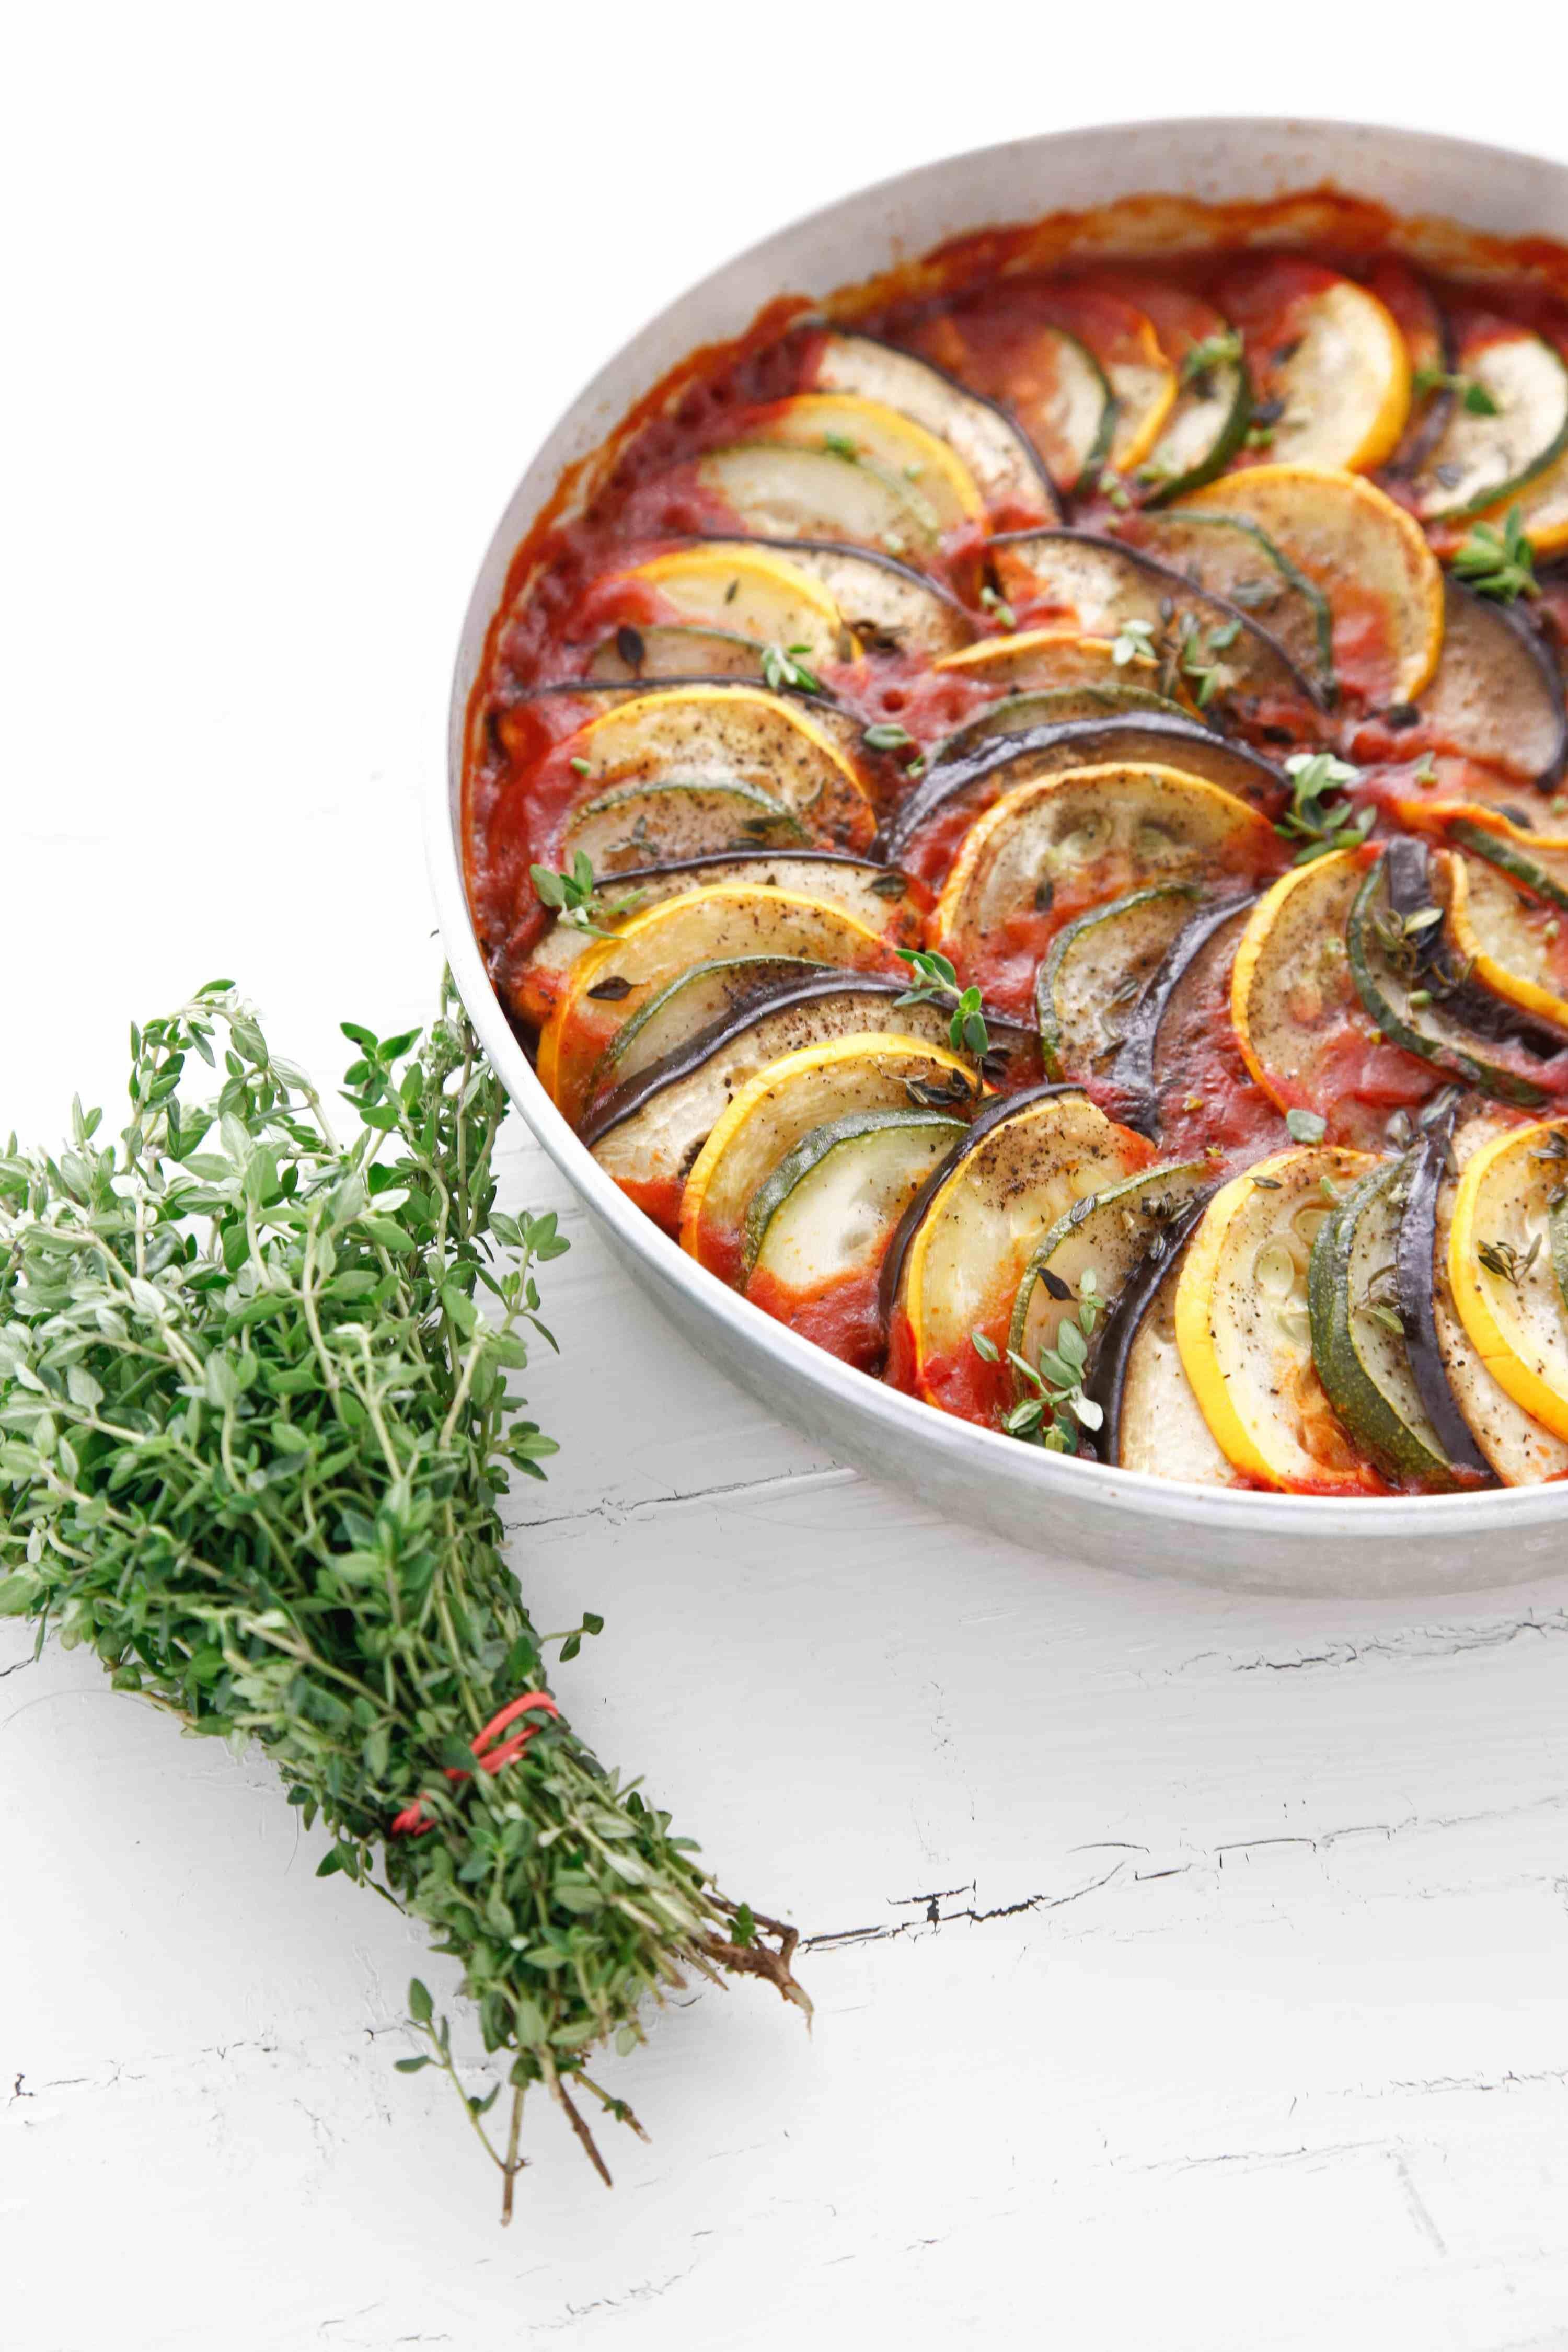 Layered ratatouille recipe veggie dishes side dish